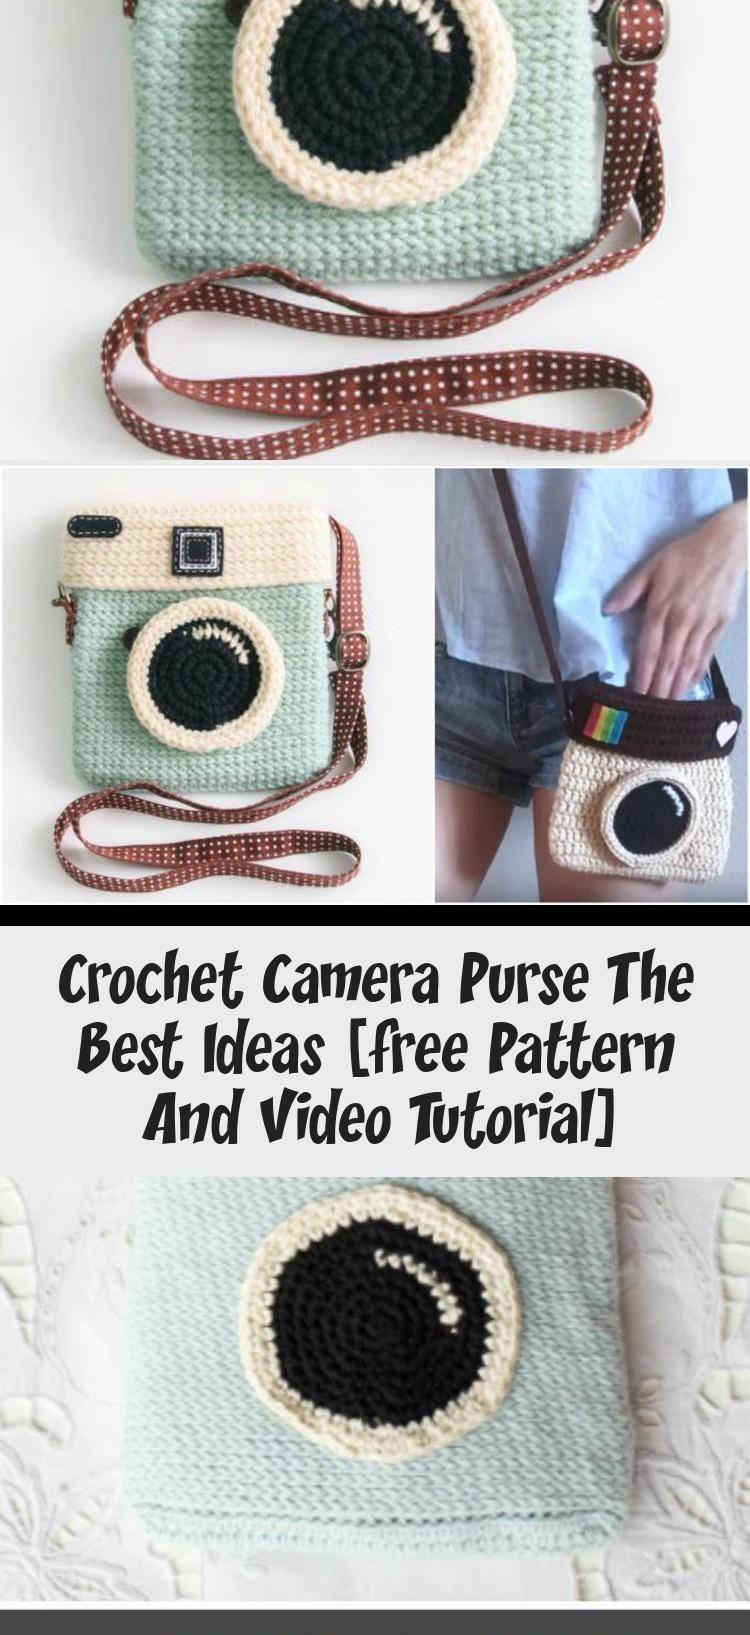 Crochet Camera Purse The Best Ideas, Free Crochet Pattern and Video Tutorial #crochetScarf #crochetFlowers #crochetBlanket #crochetClothes #crochetSweater